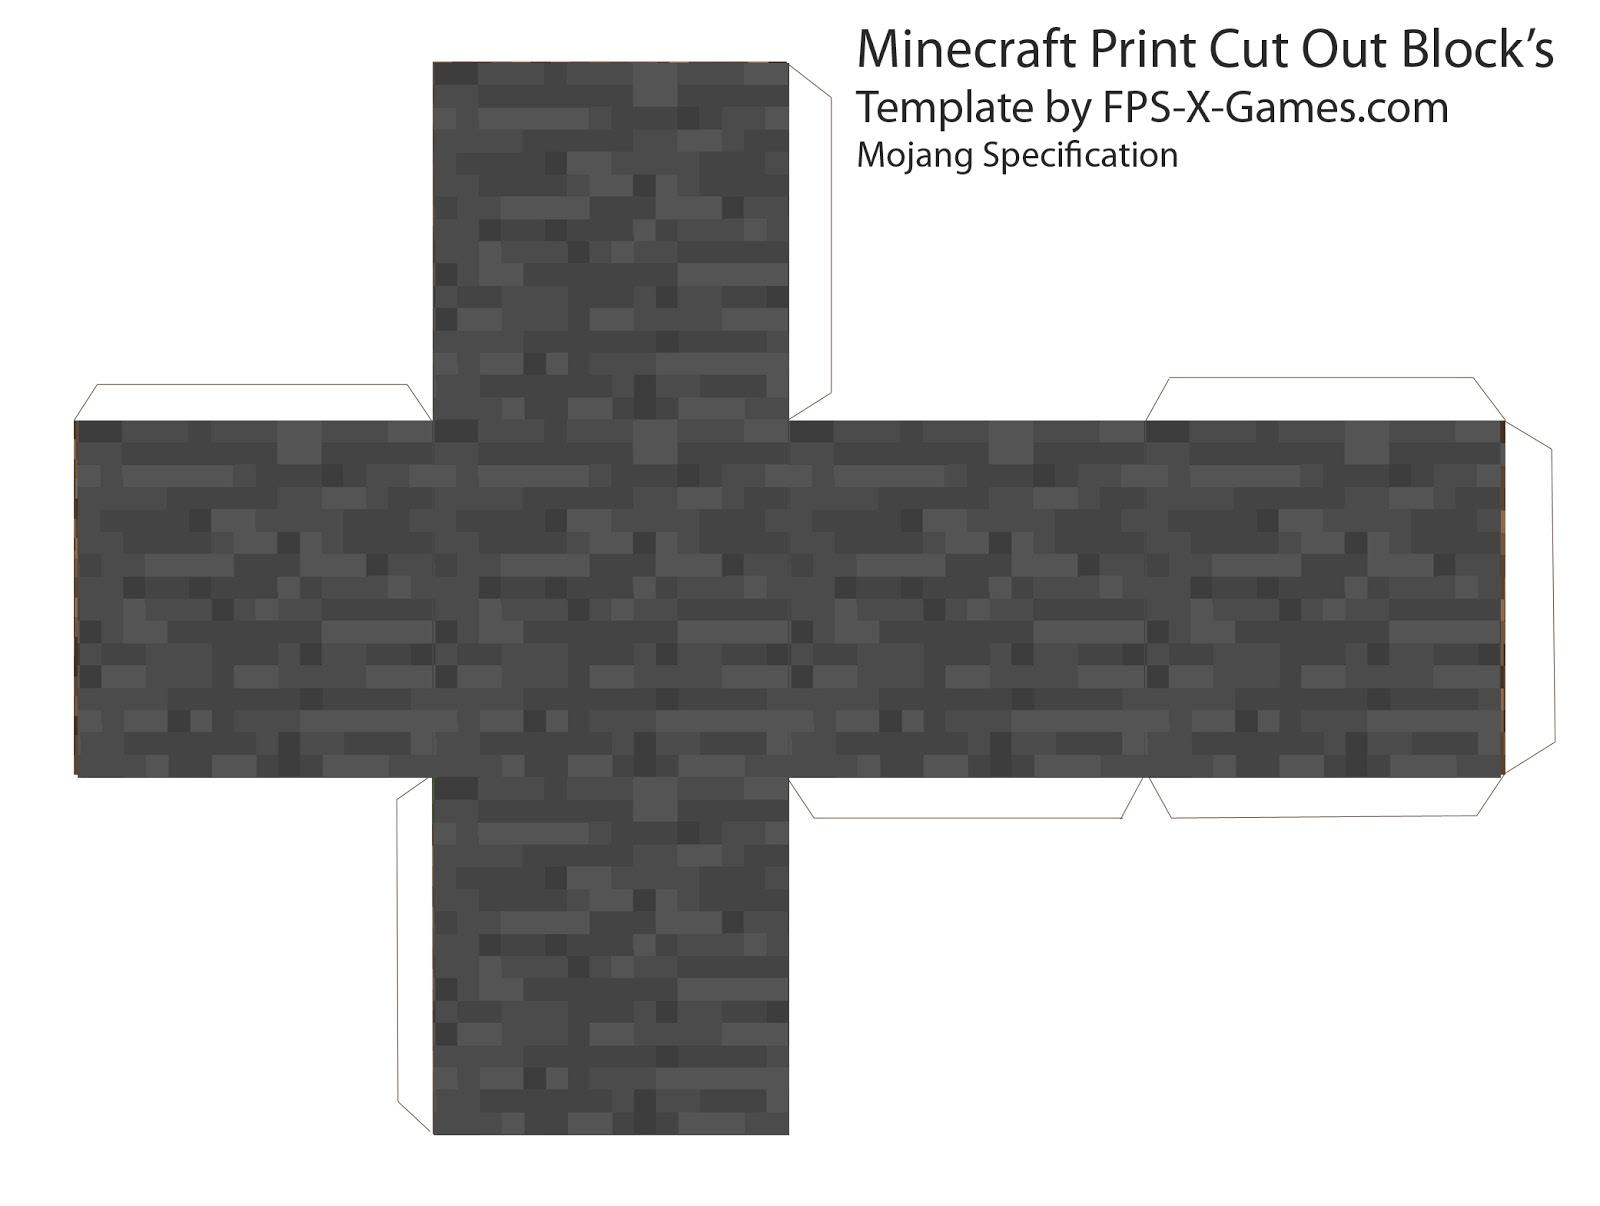 Furnace minecraft furnace printable papercraft template.